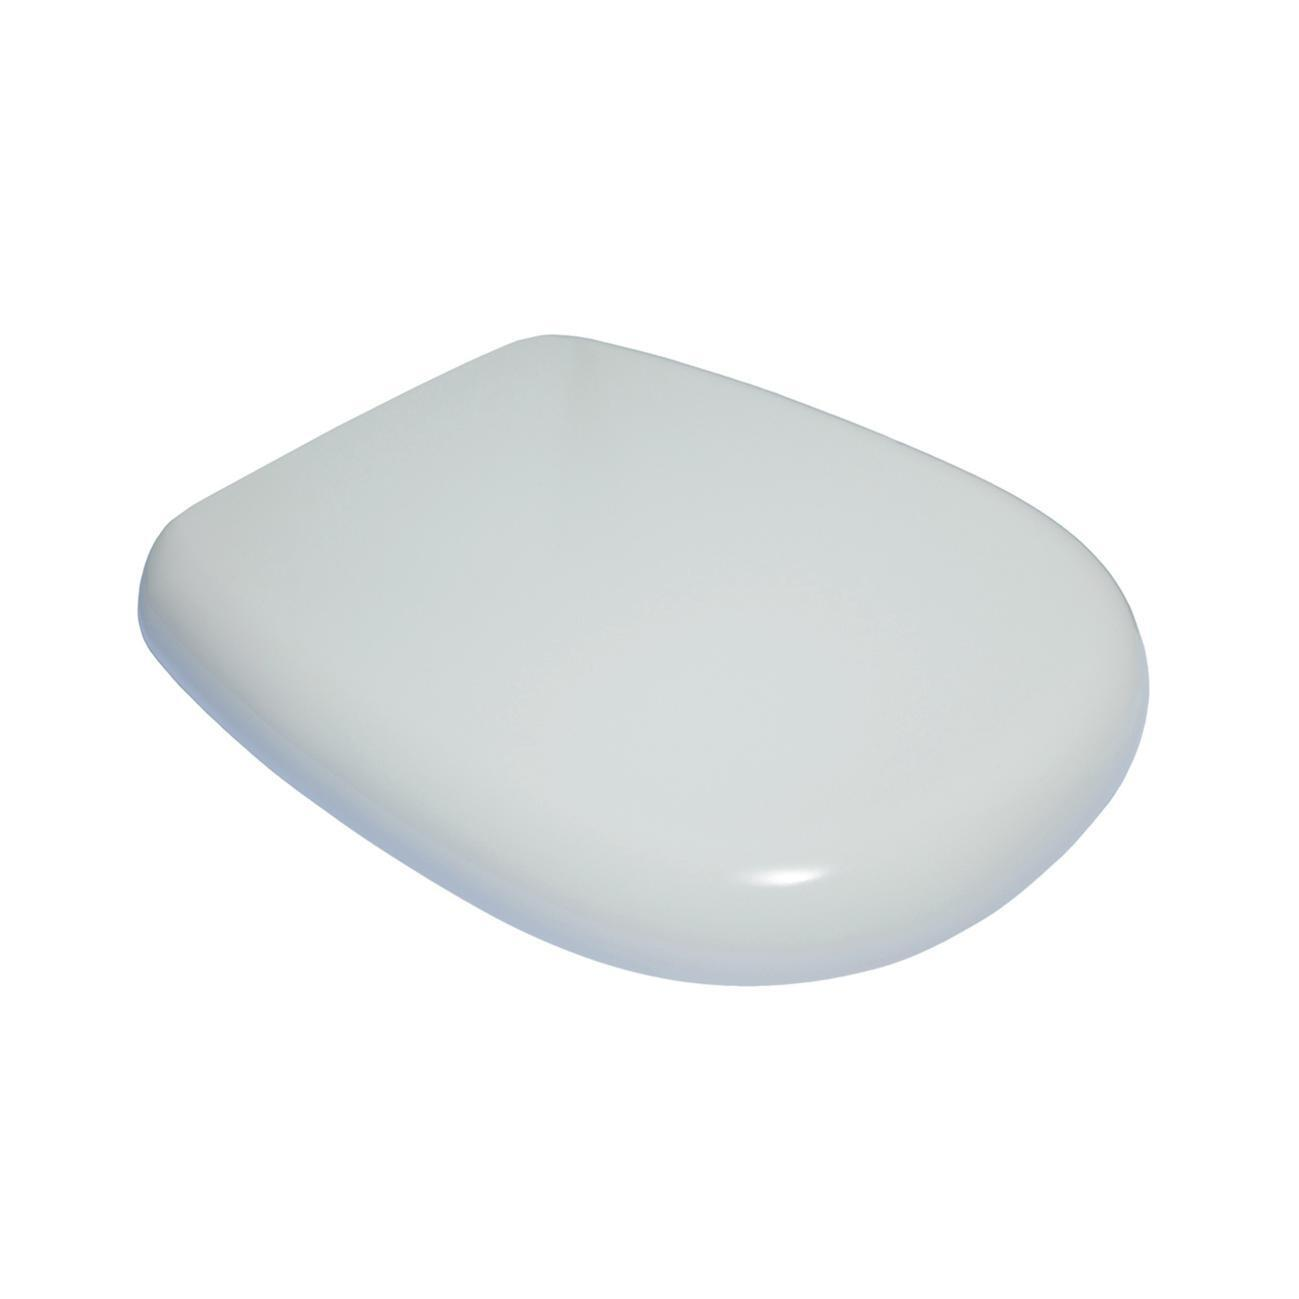 Copriwater rettangolare Originale per serie sanitari Tesi IDEAL STANDARD termoindurente bianco - 5